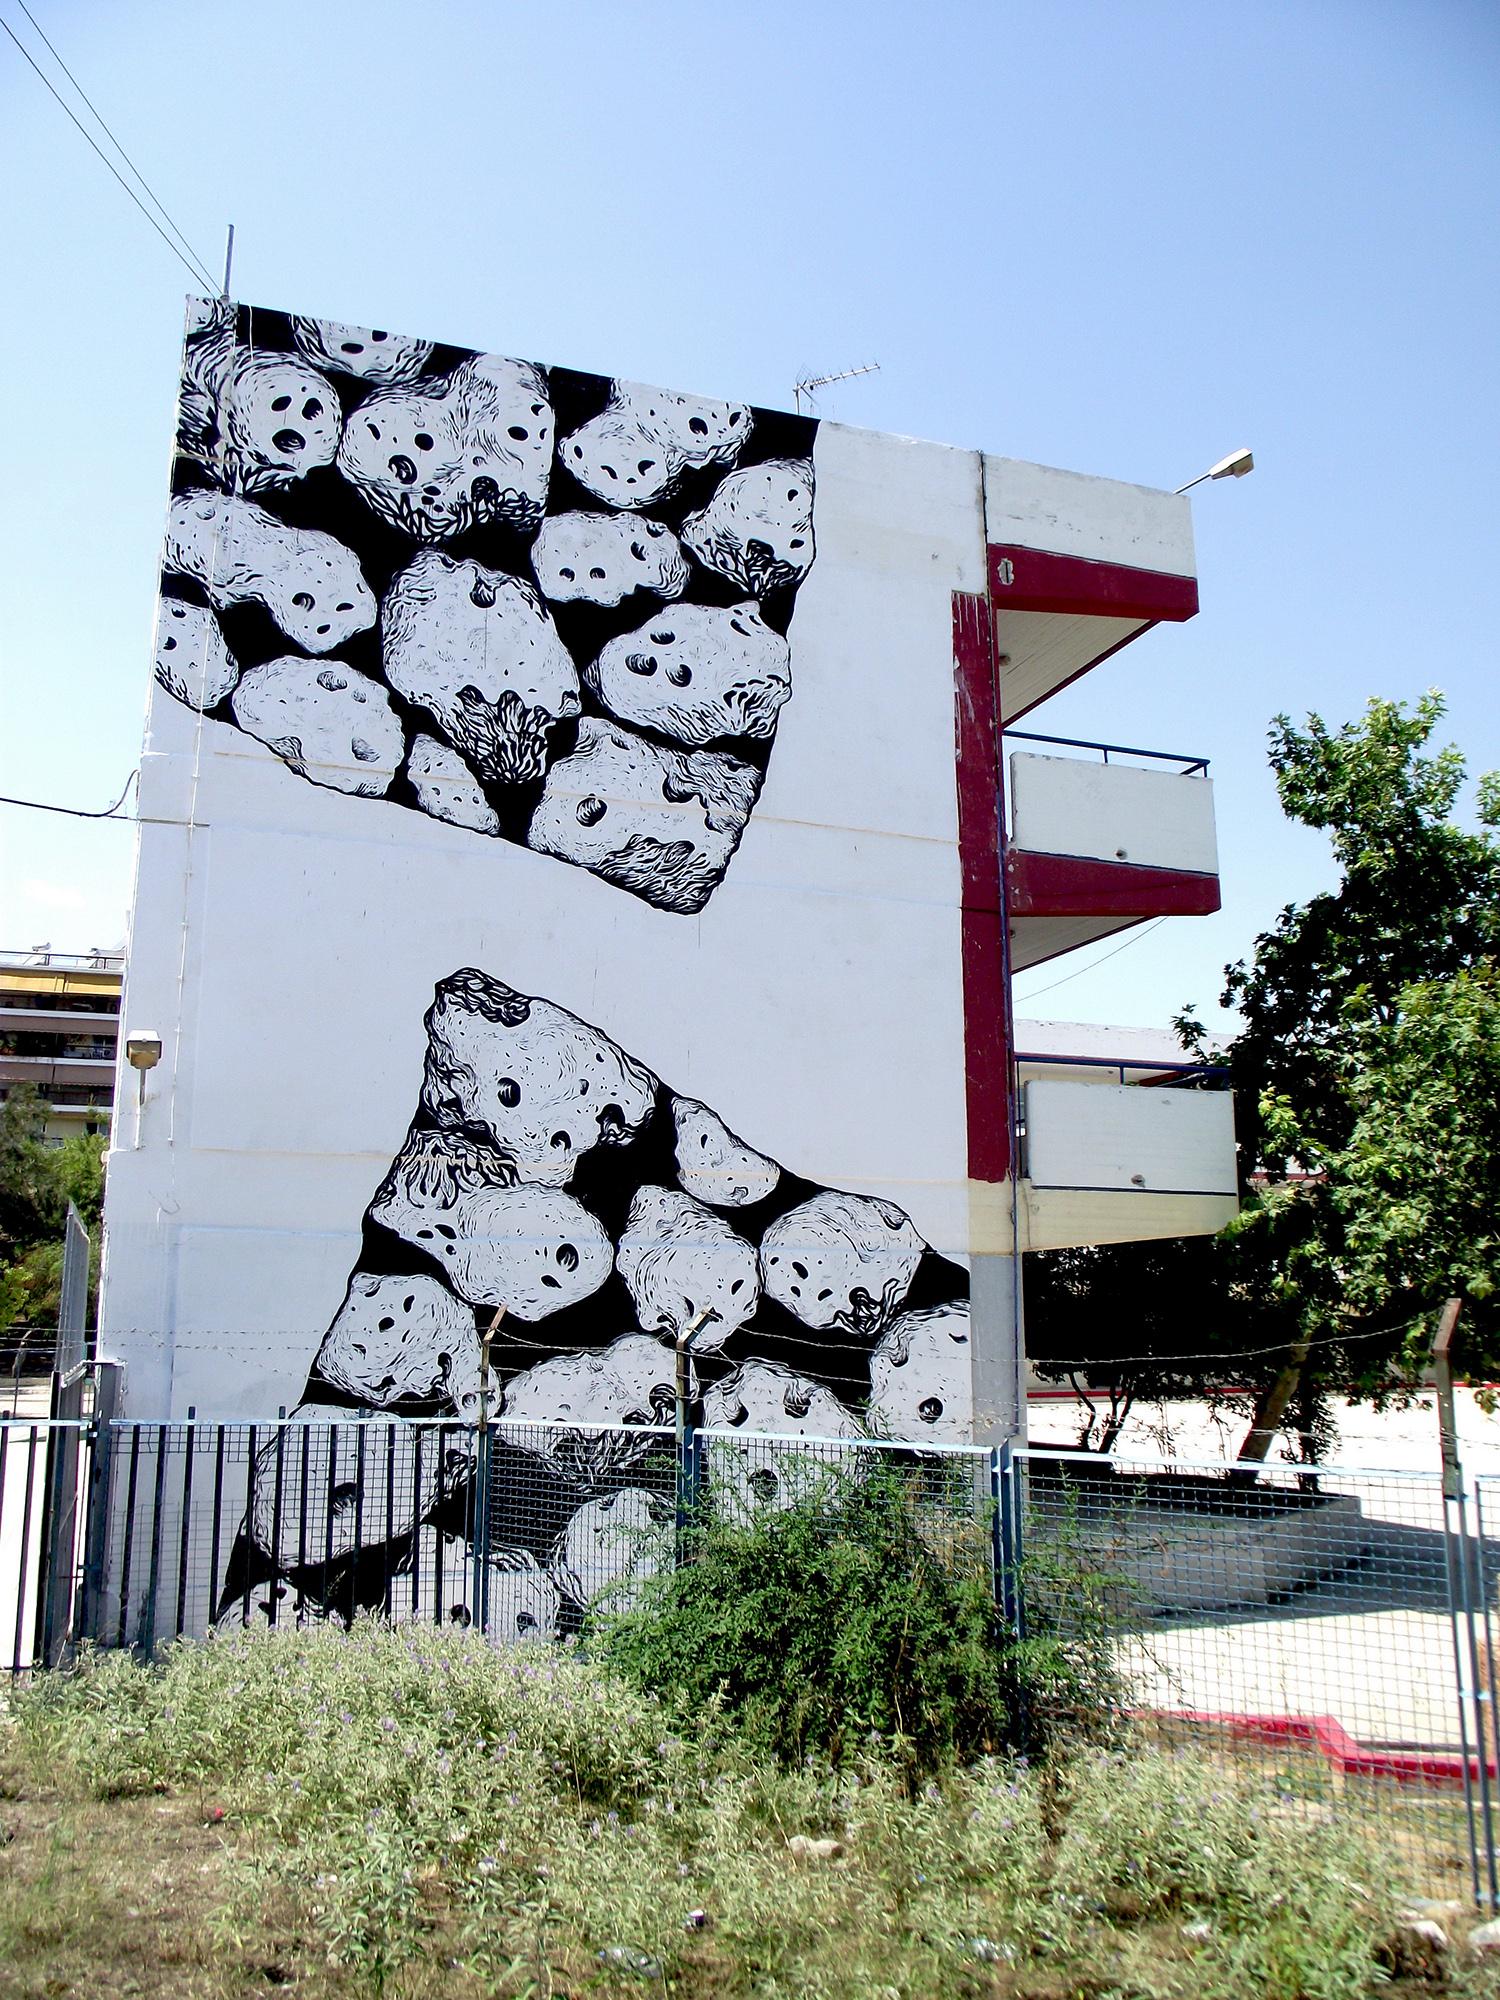 Luigi Loquarto Gig Athens Street Art Festival